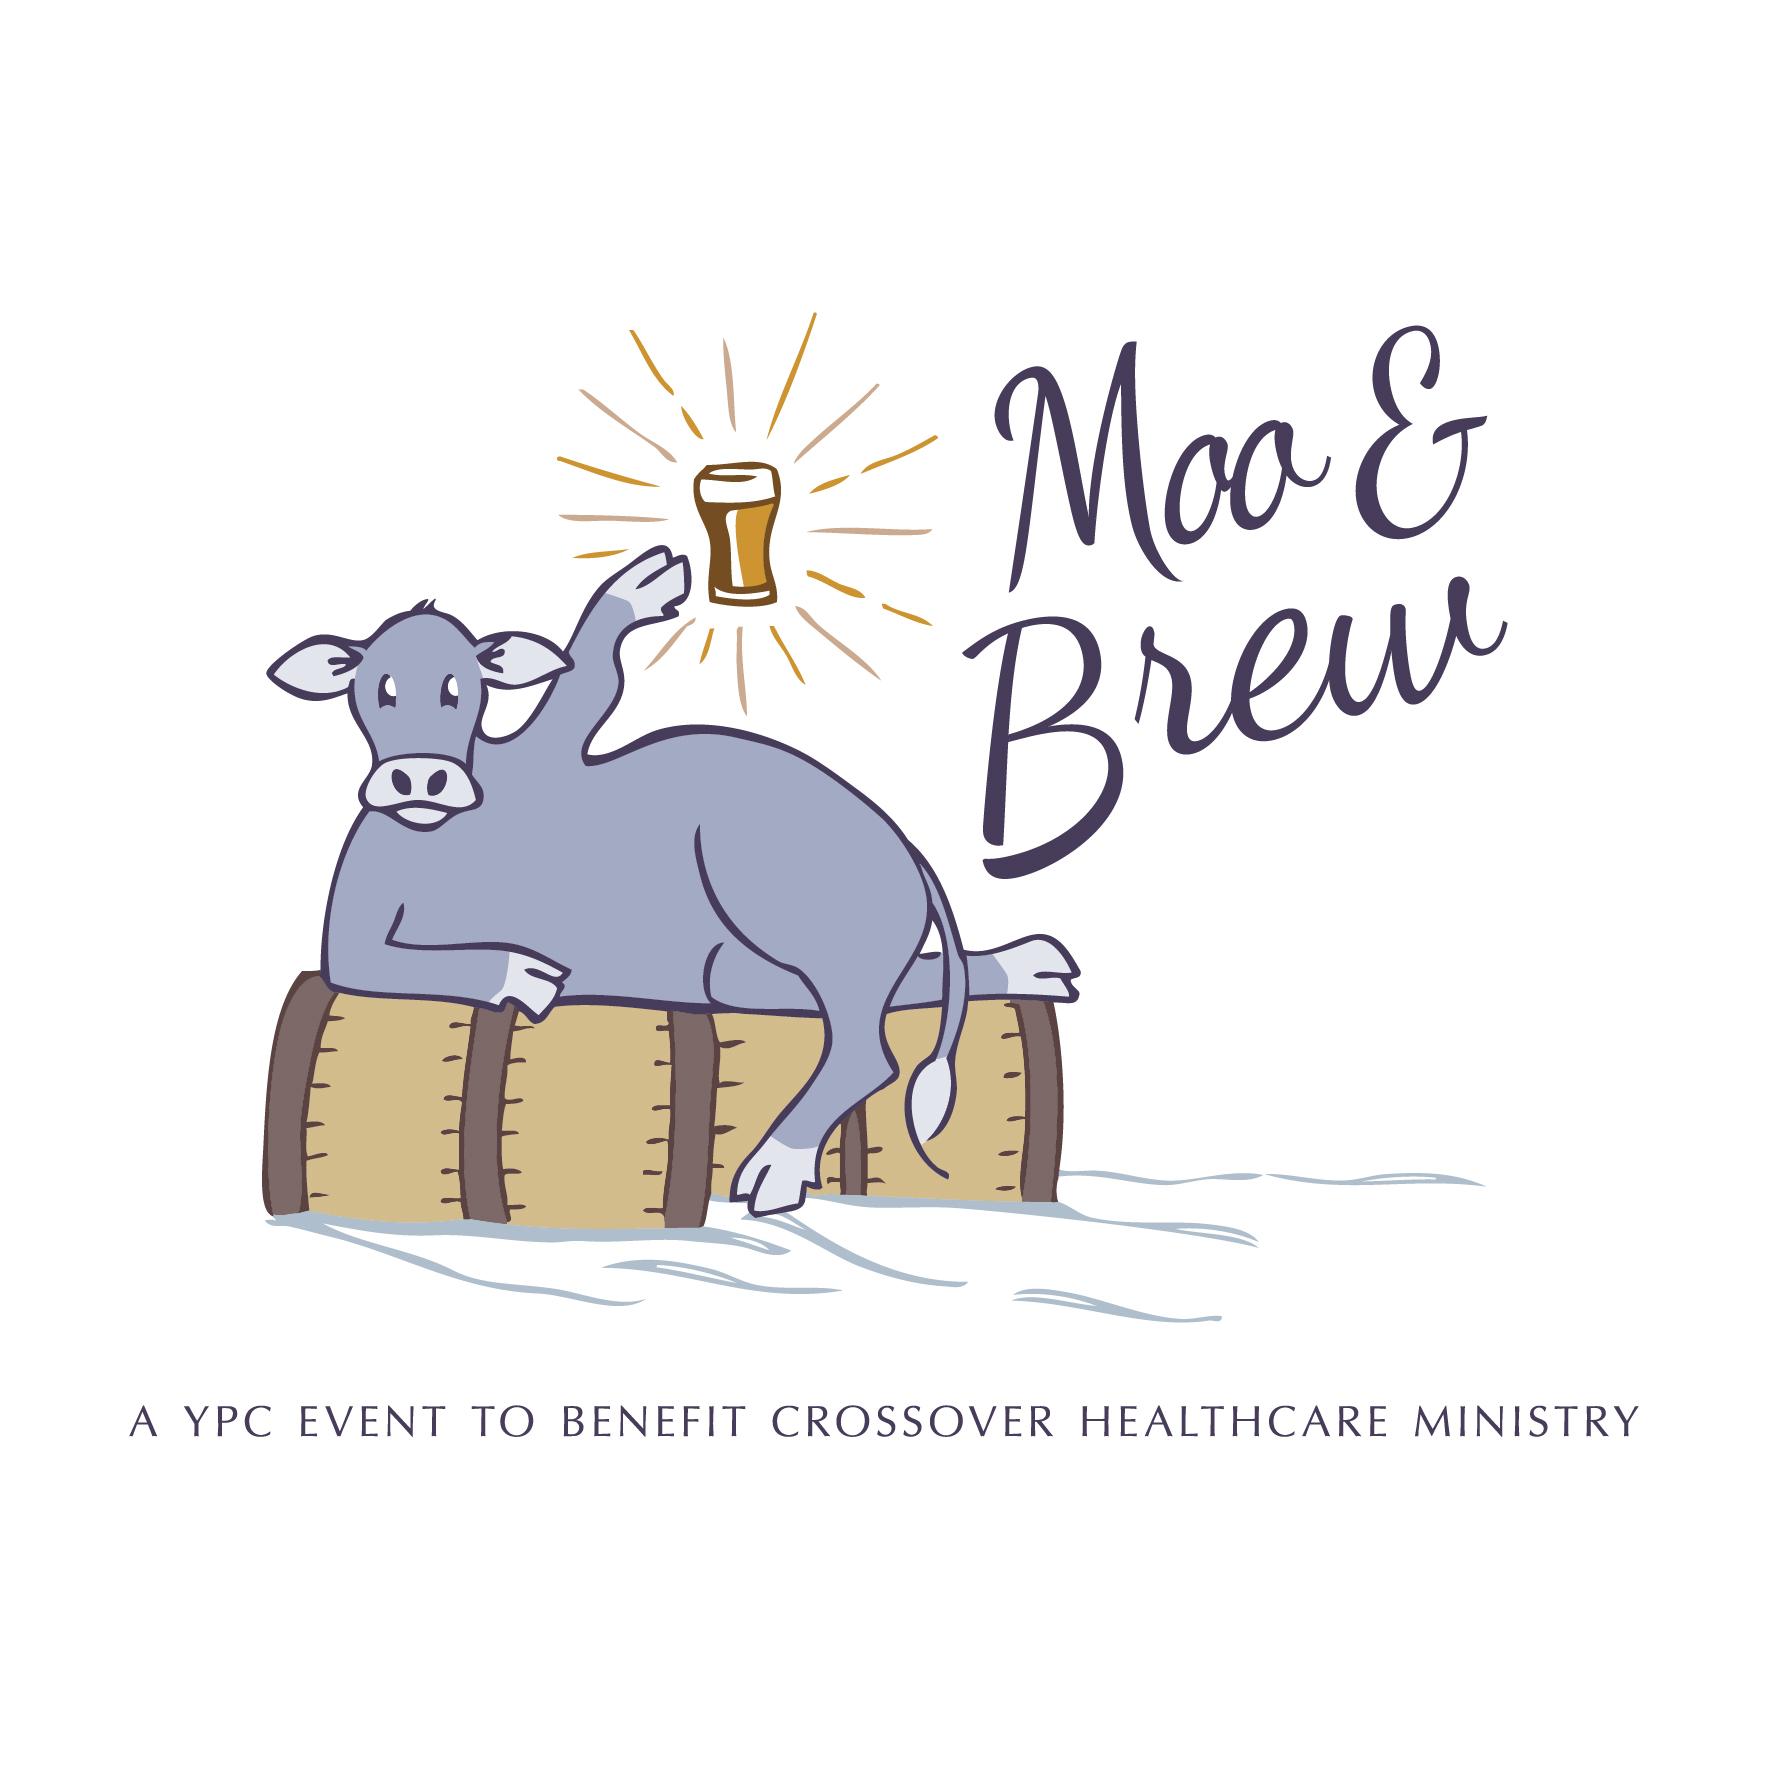 Moo & Brew